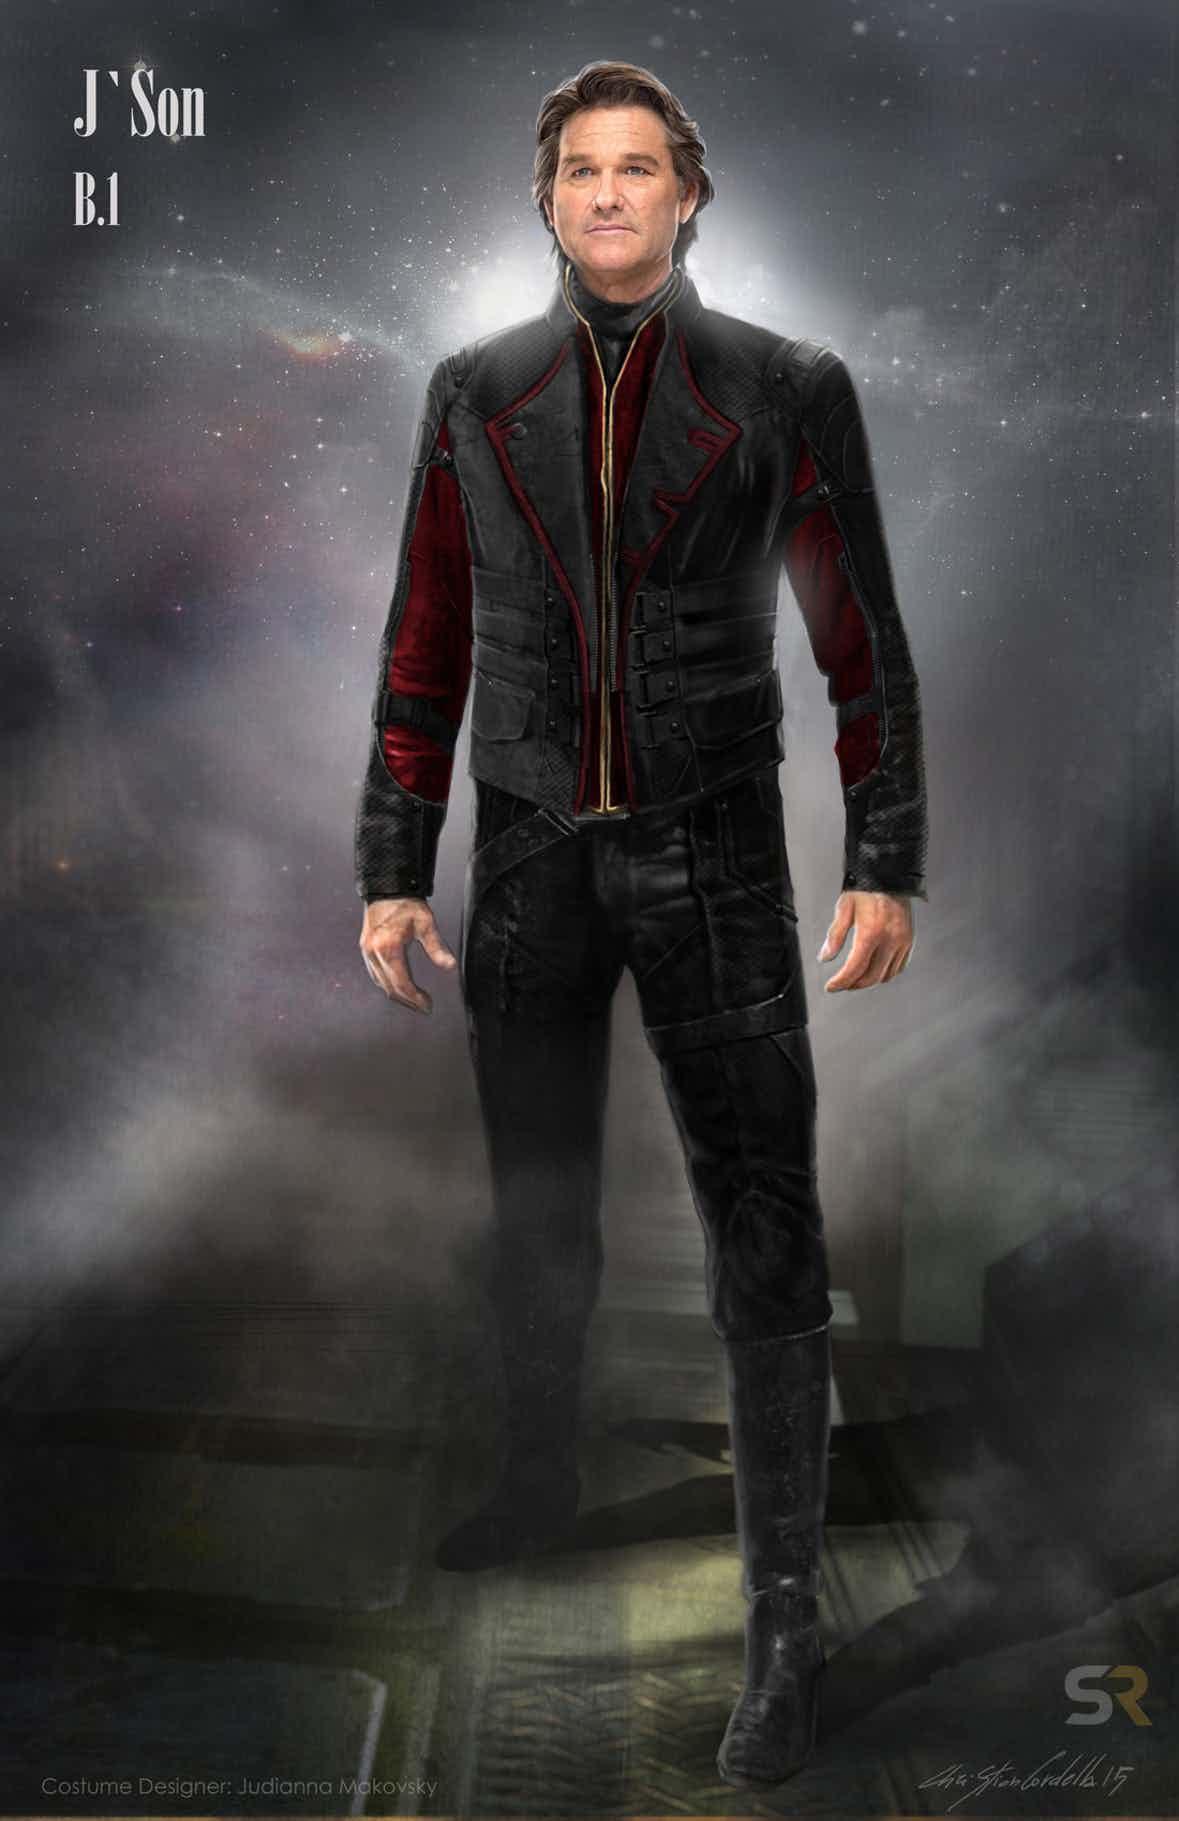 Guardians-of-the-Galaxy-2-Ego-Concept-Art-Christian-Cordella